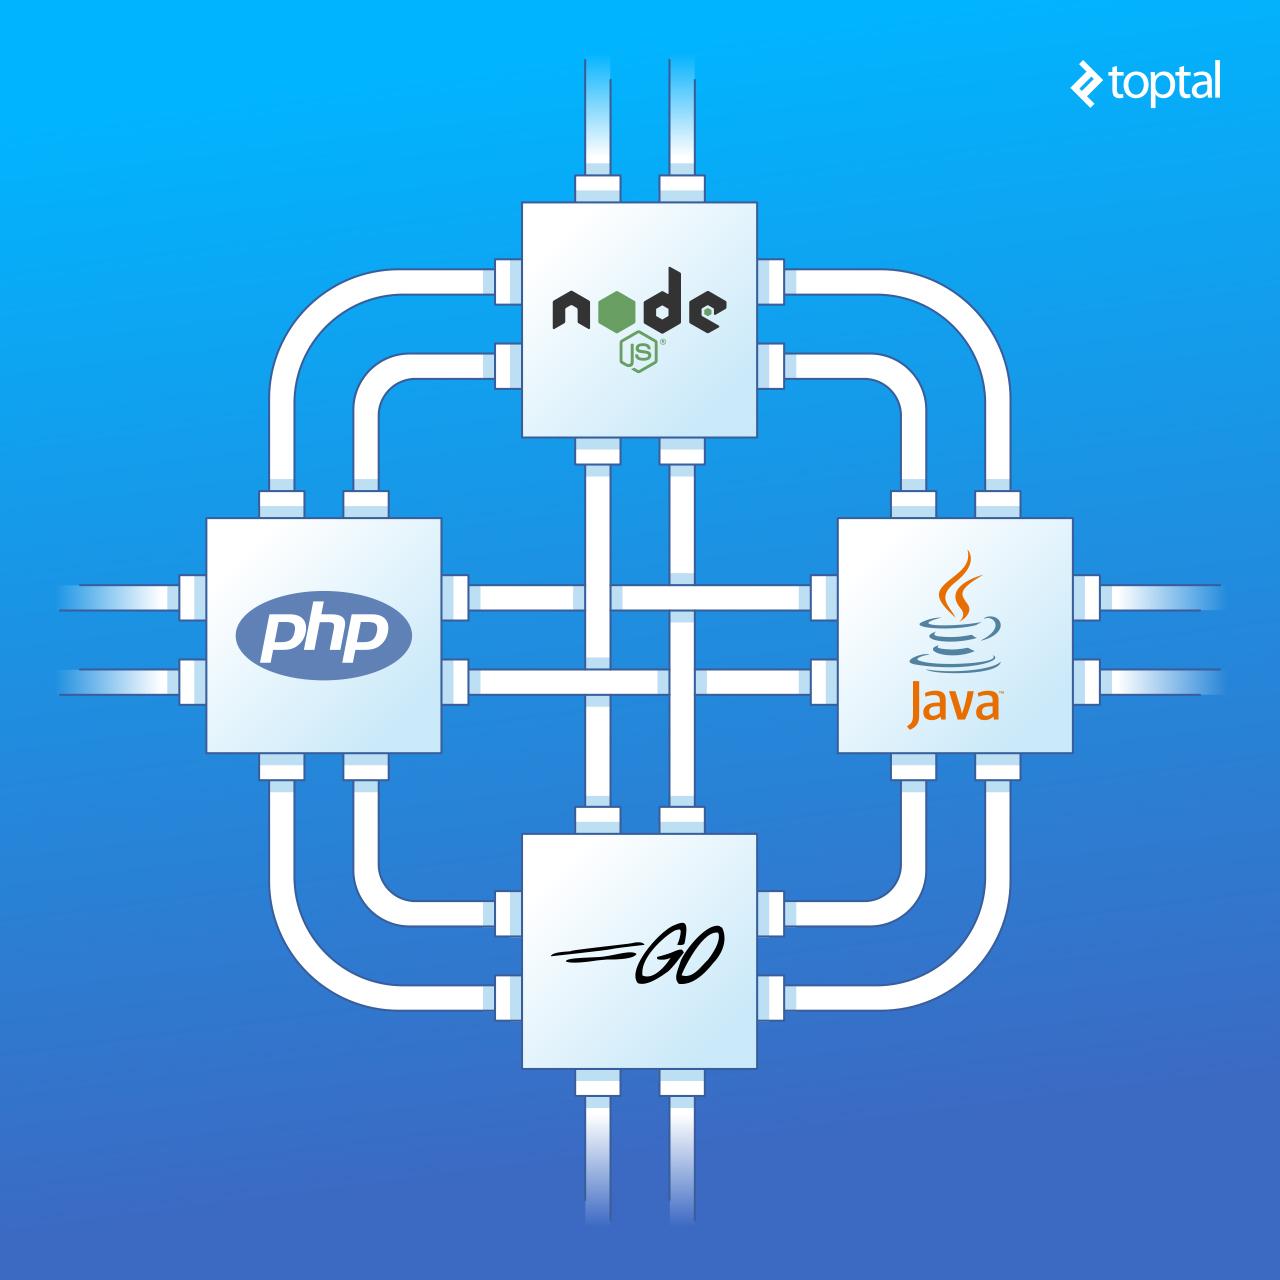 cover photo server side io node vs php vs